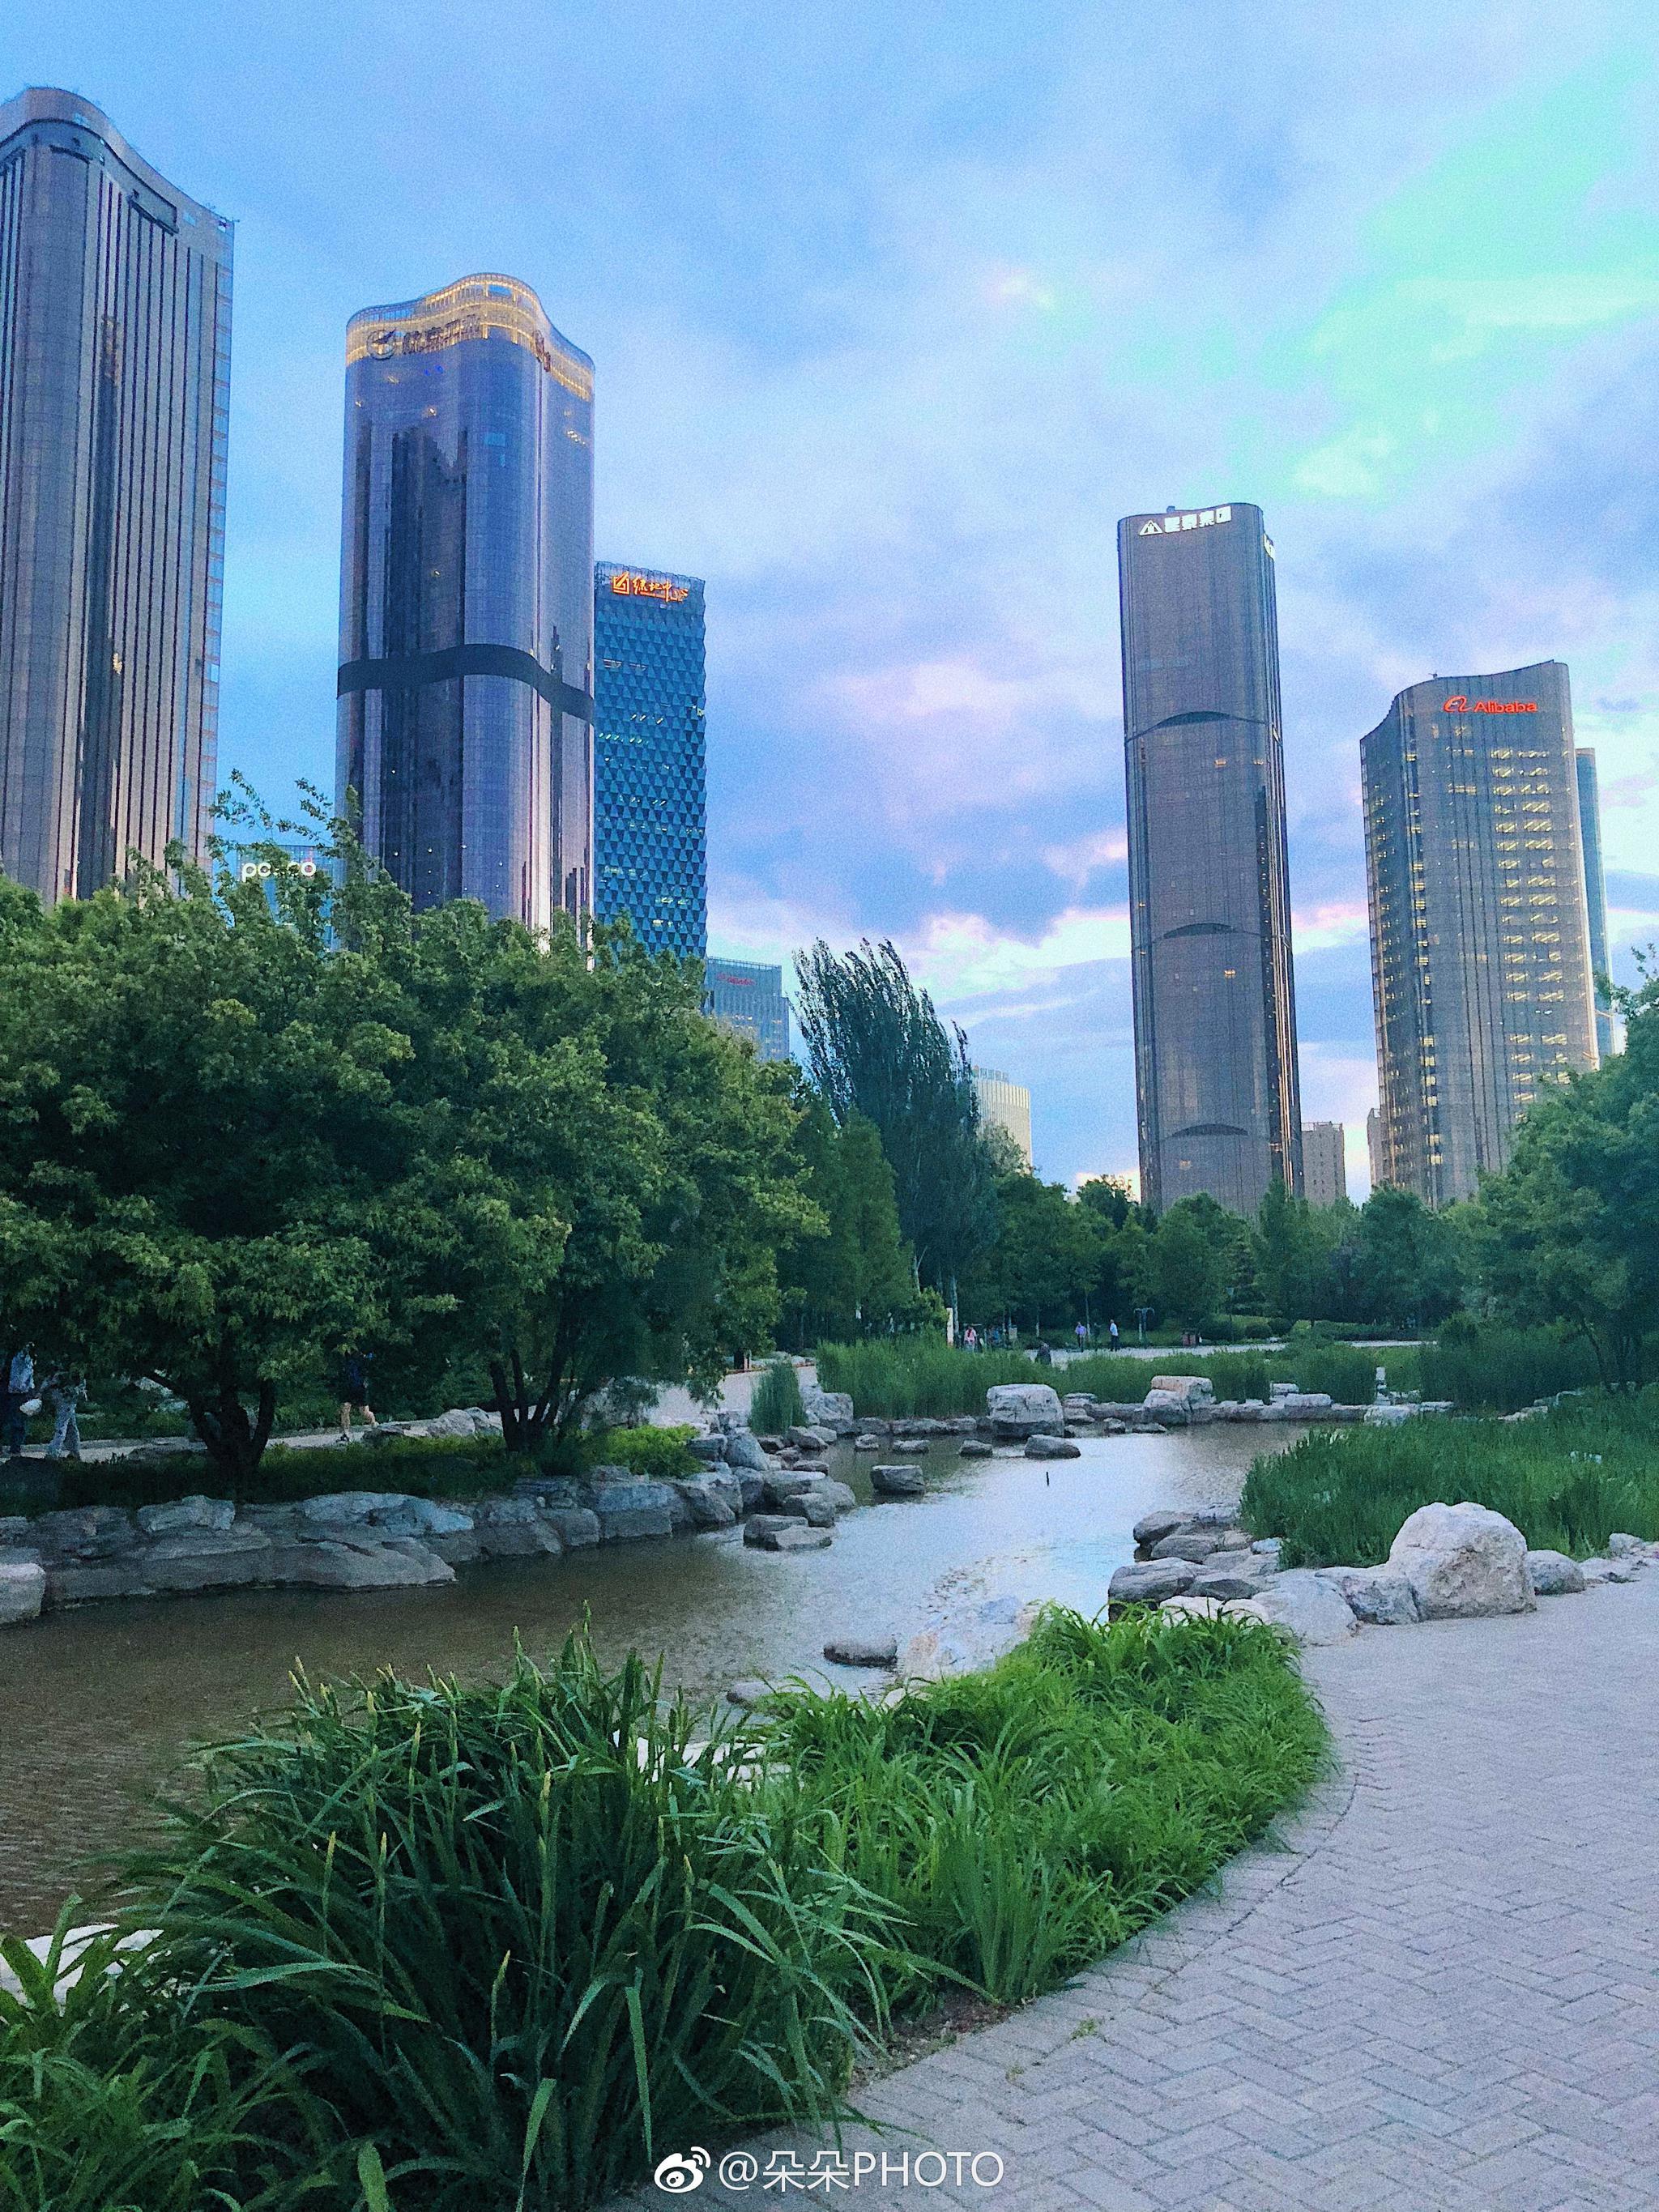 Get一个朝阳外景拍摄地儿:大望京公园,人少景新